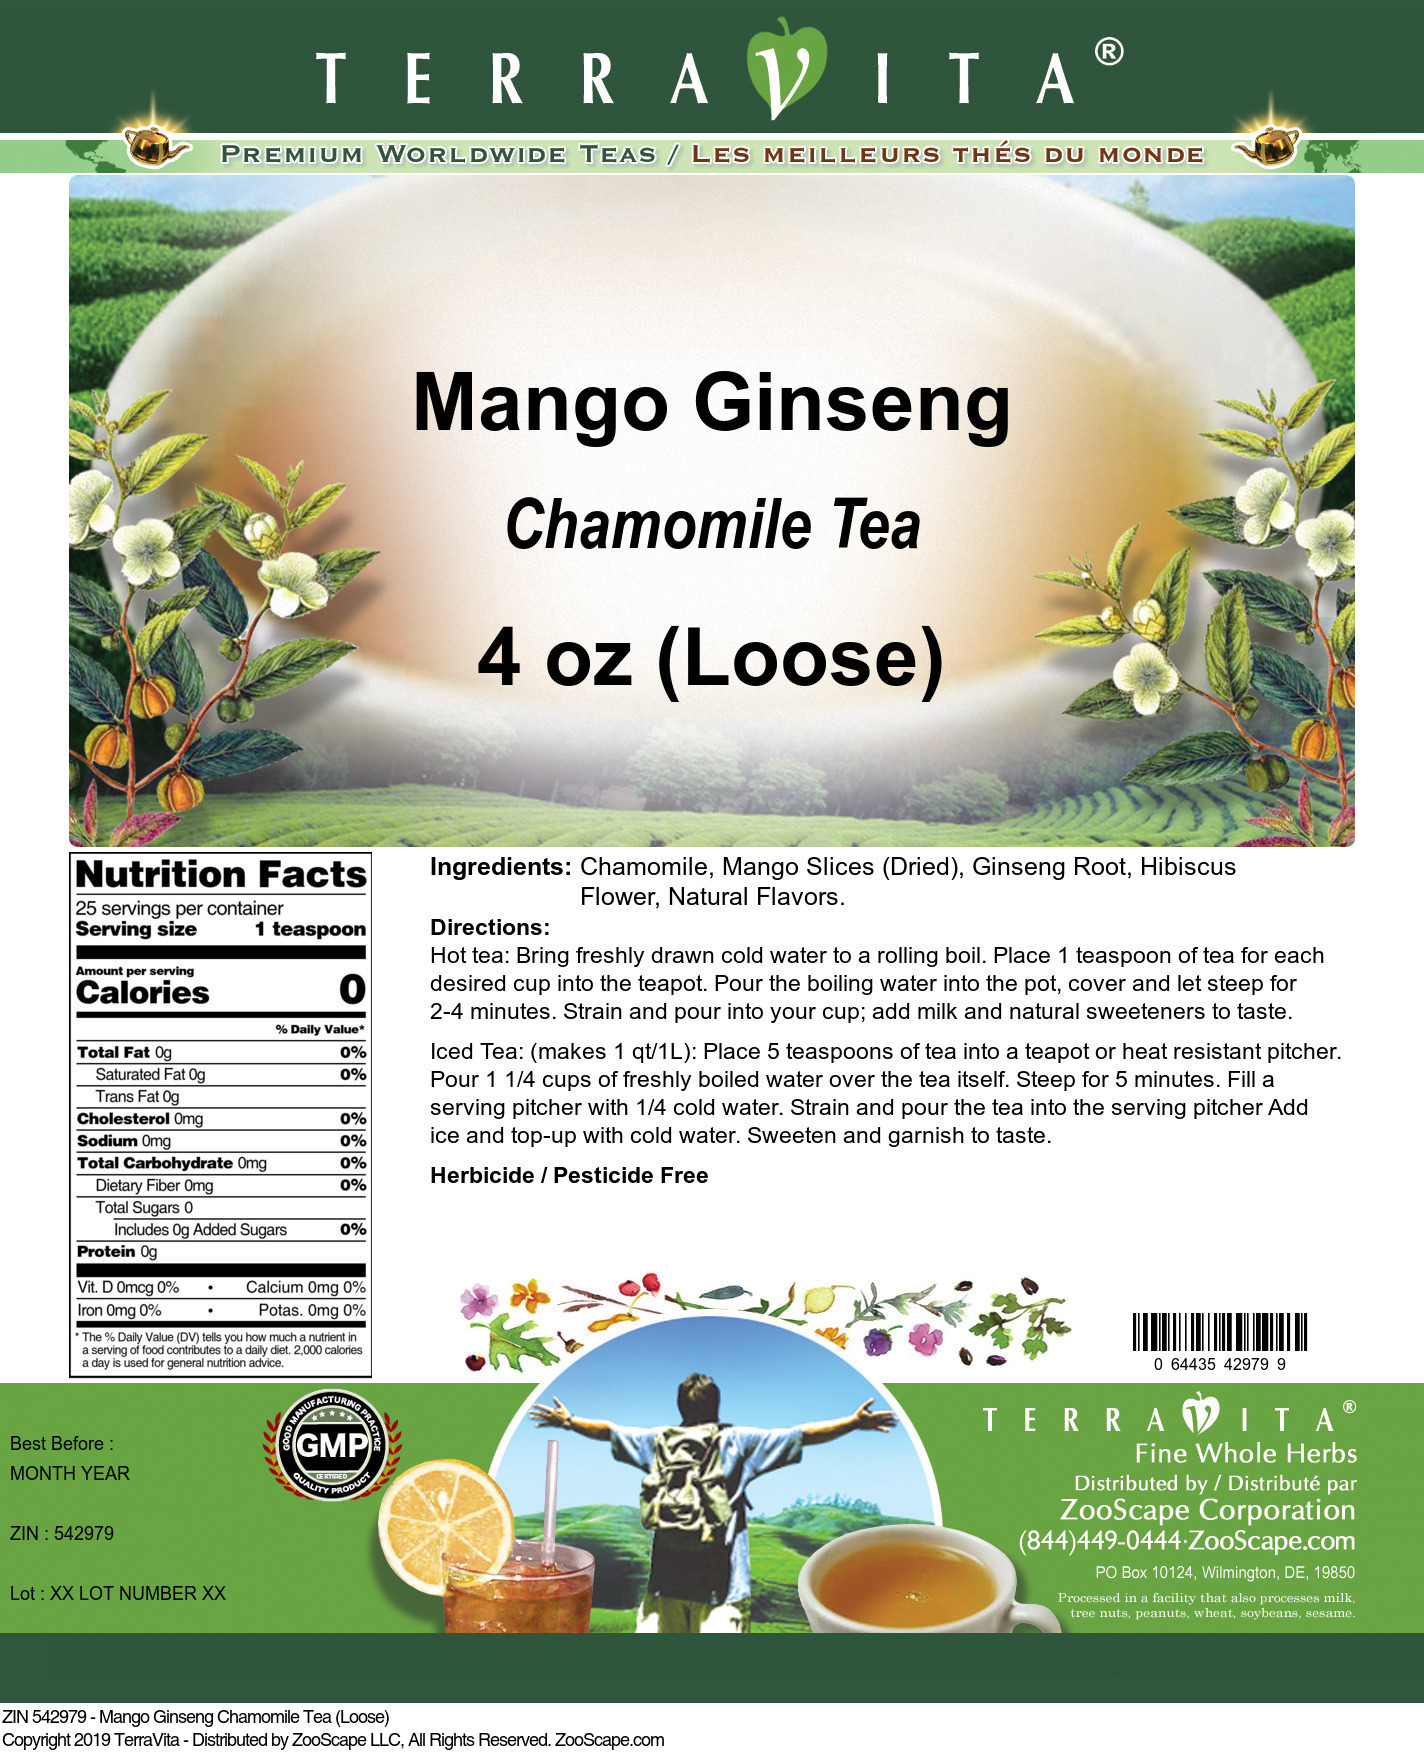 Mango Ginseng Chamomile Tea (Loose)